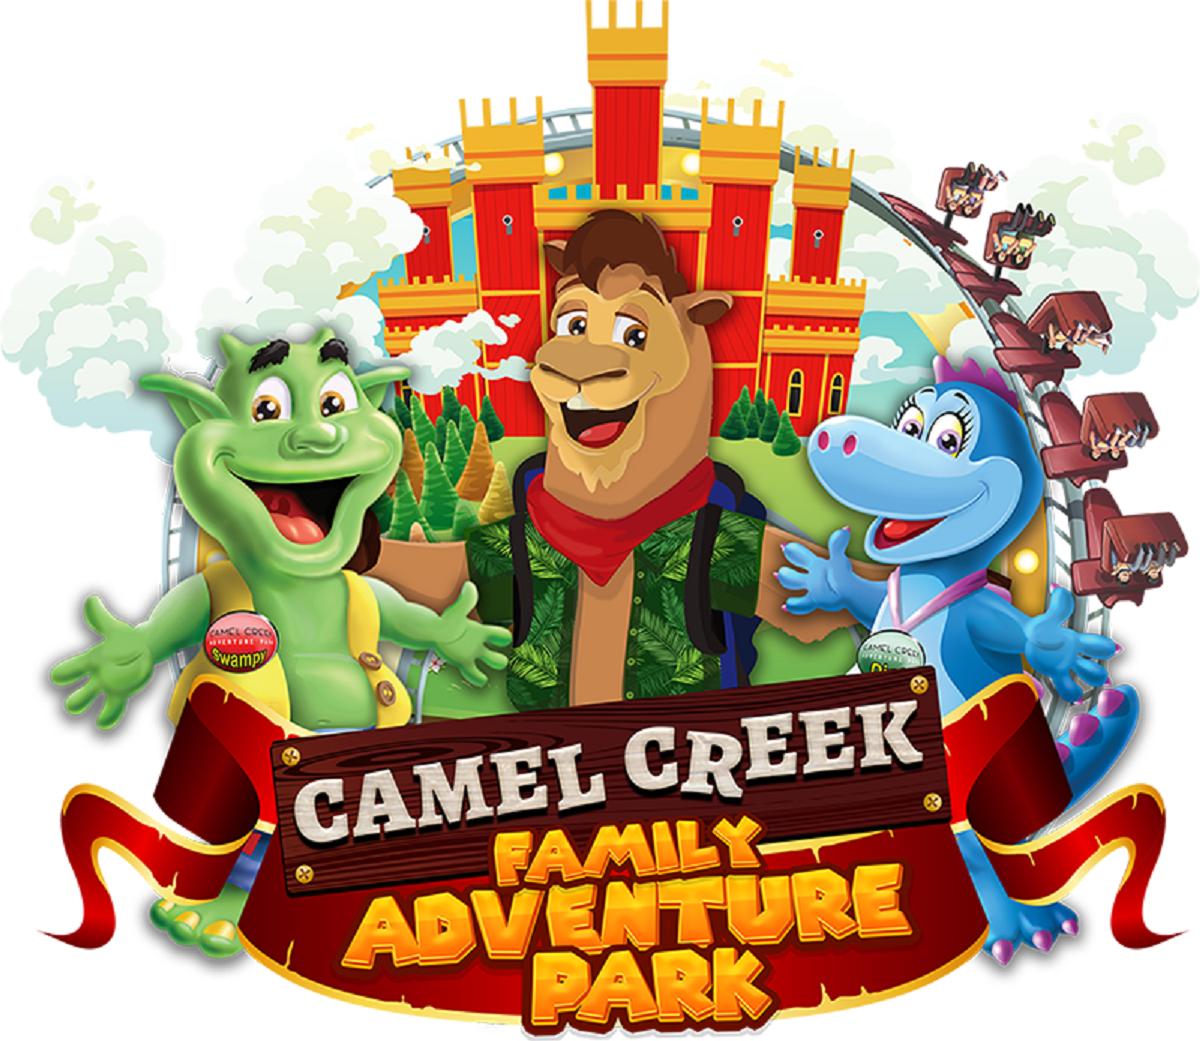 Camel Creek mobile app